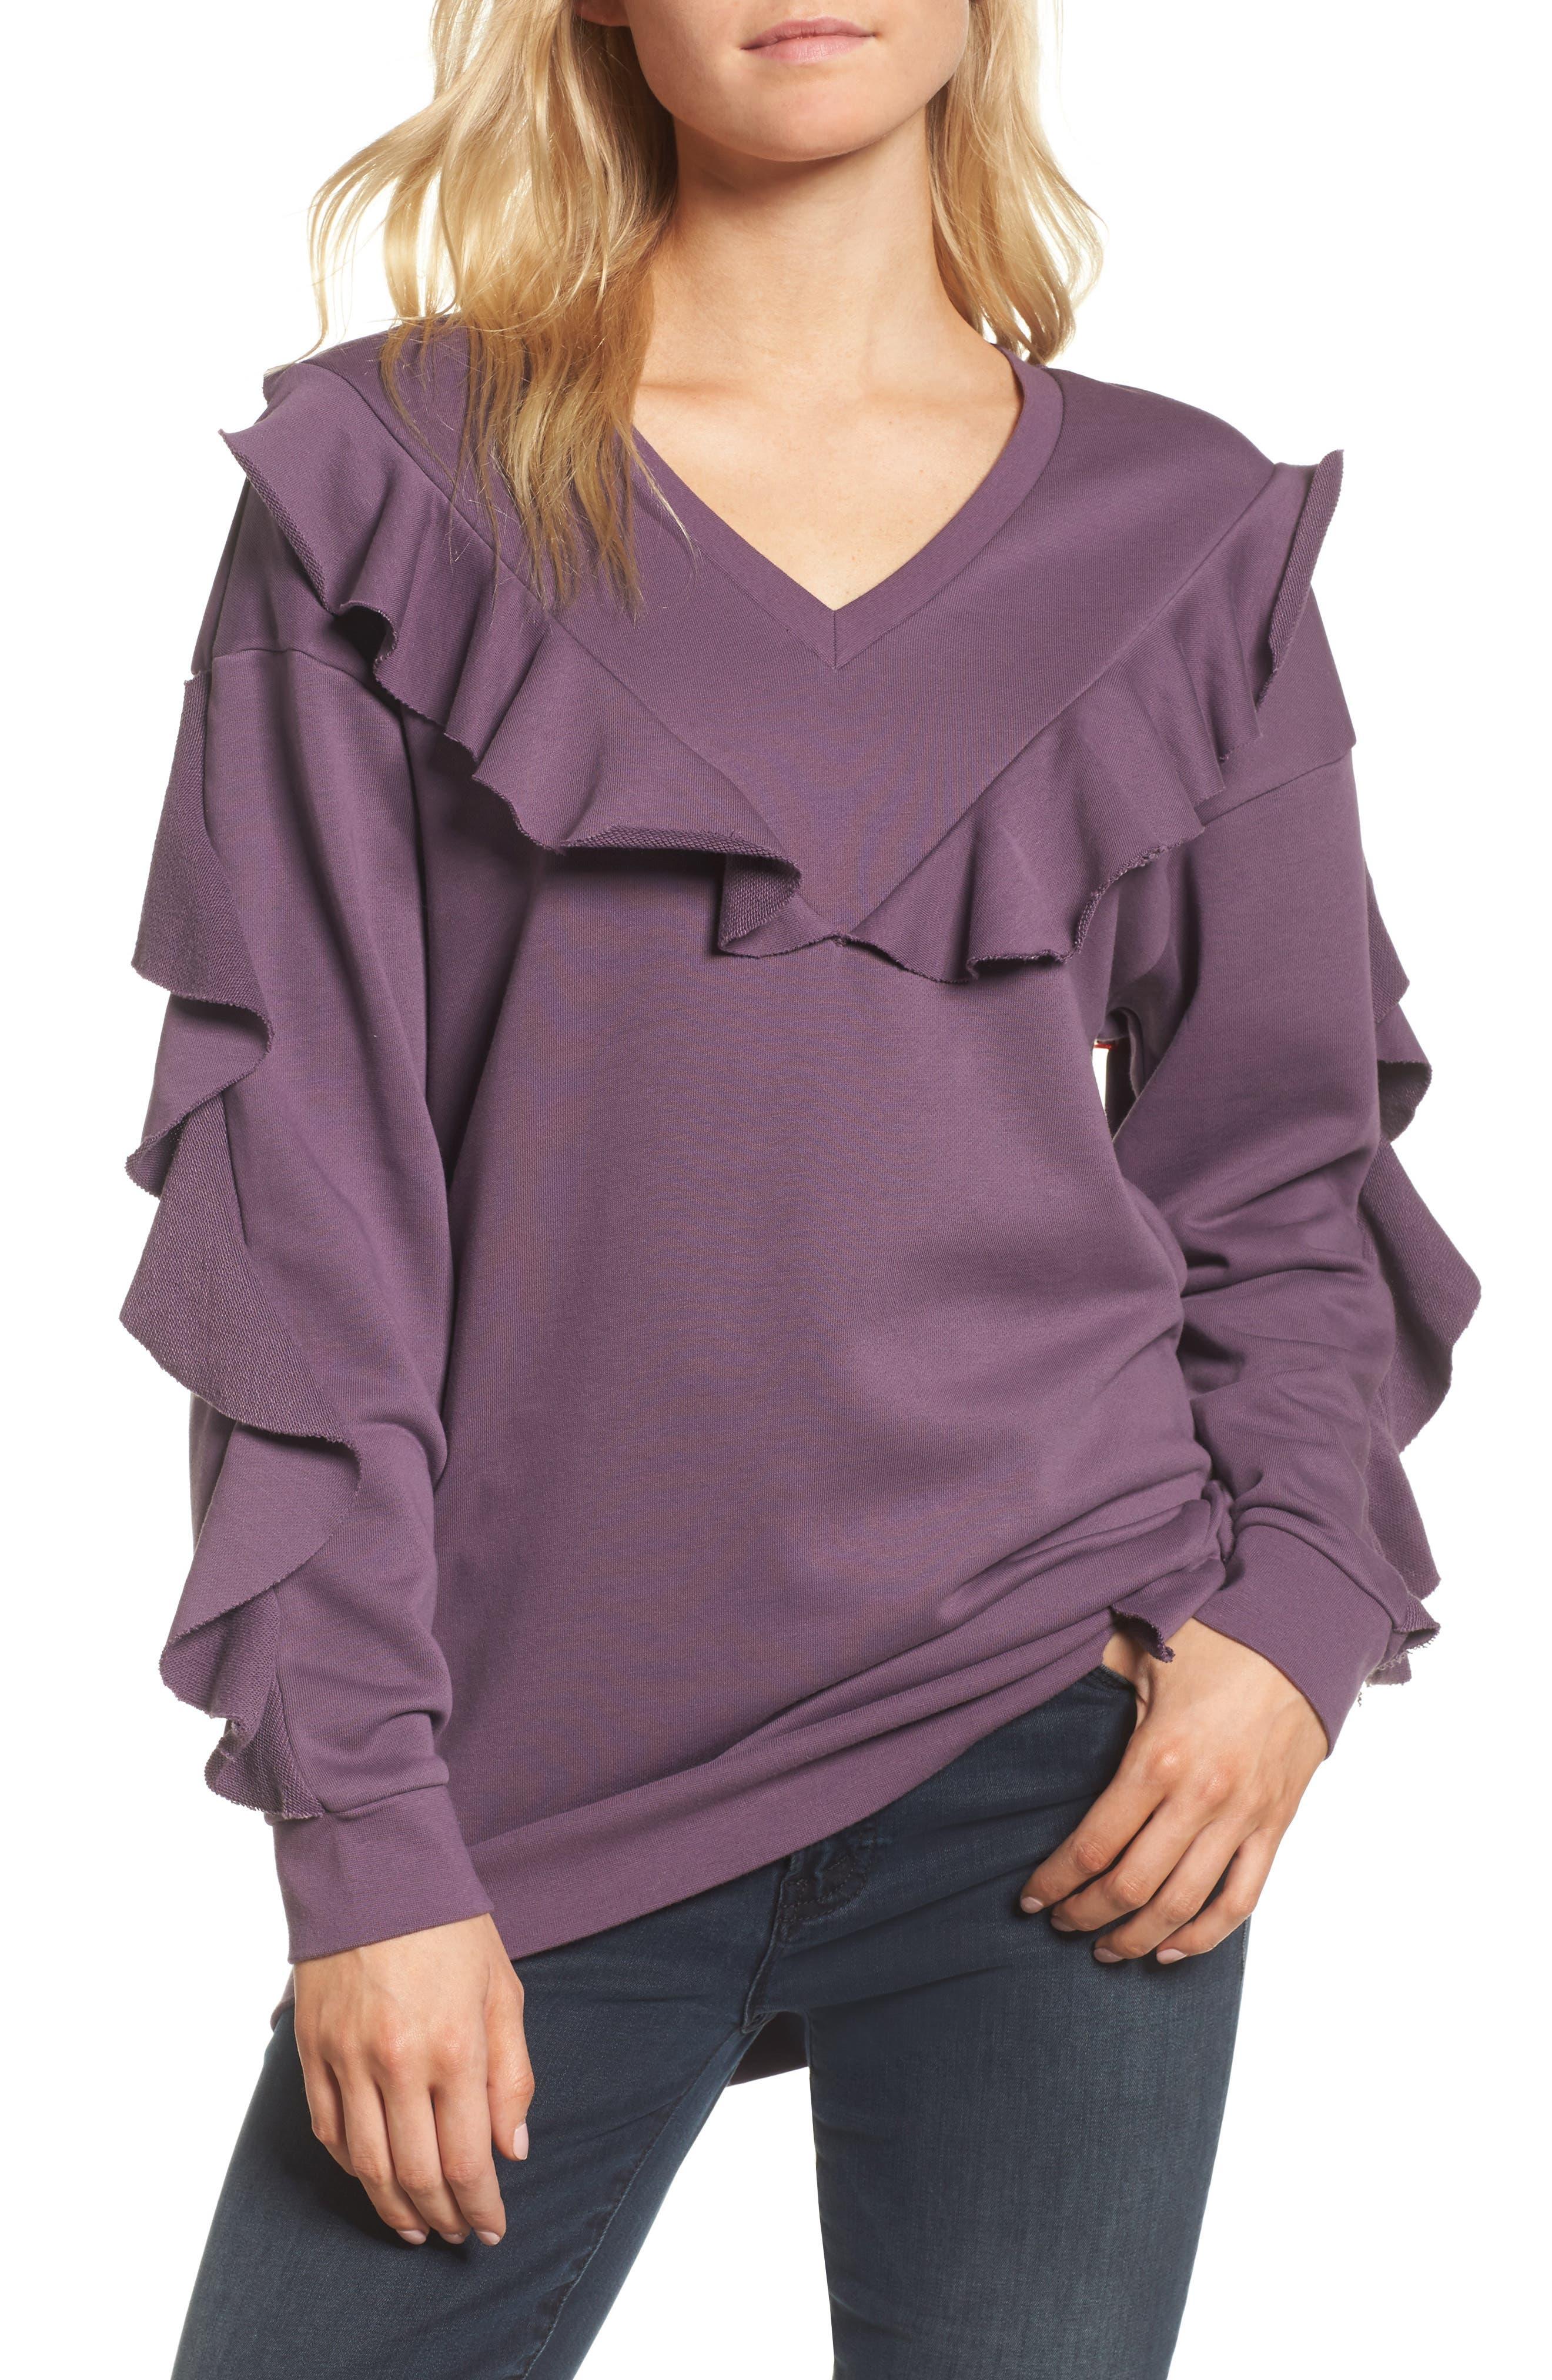 Main Image - Chelsea28 Ruffle Sweatshirt